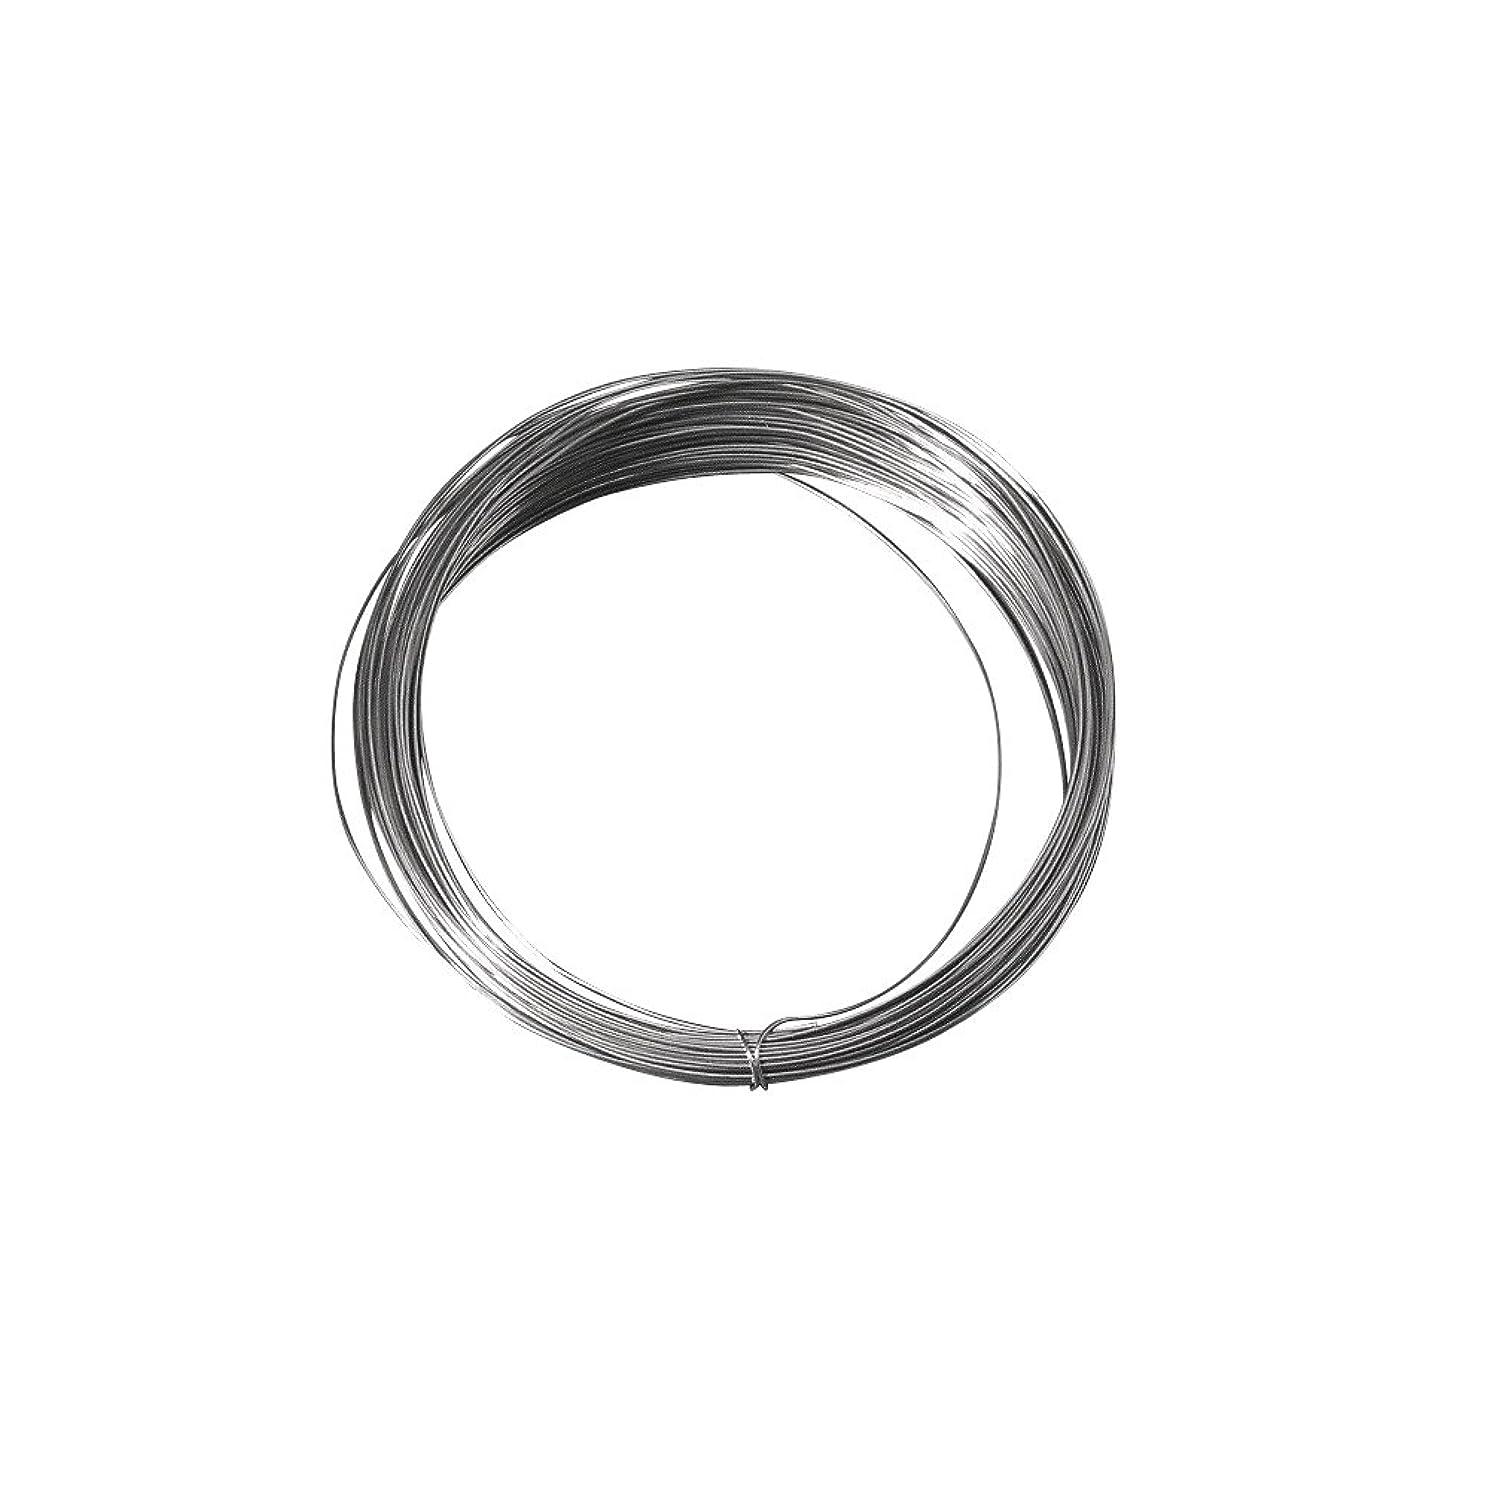 RAYHER 2414300?Copper Wire 1.2?mm ? ?, X 3?M